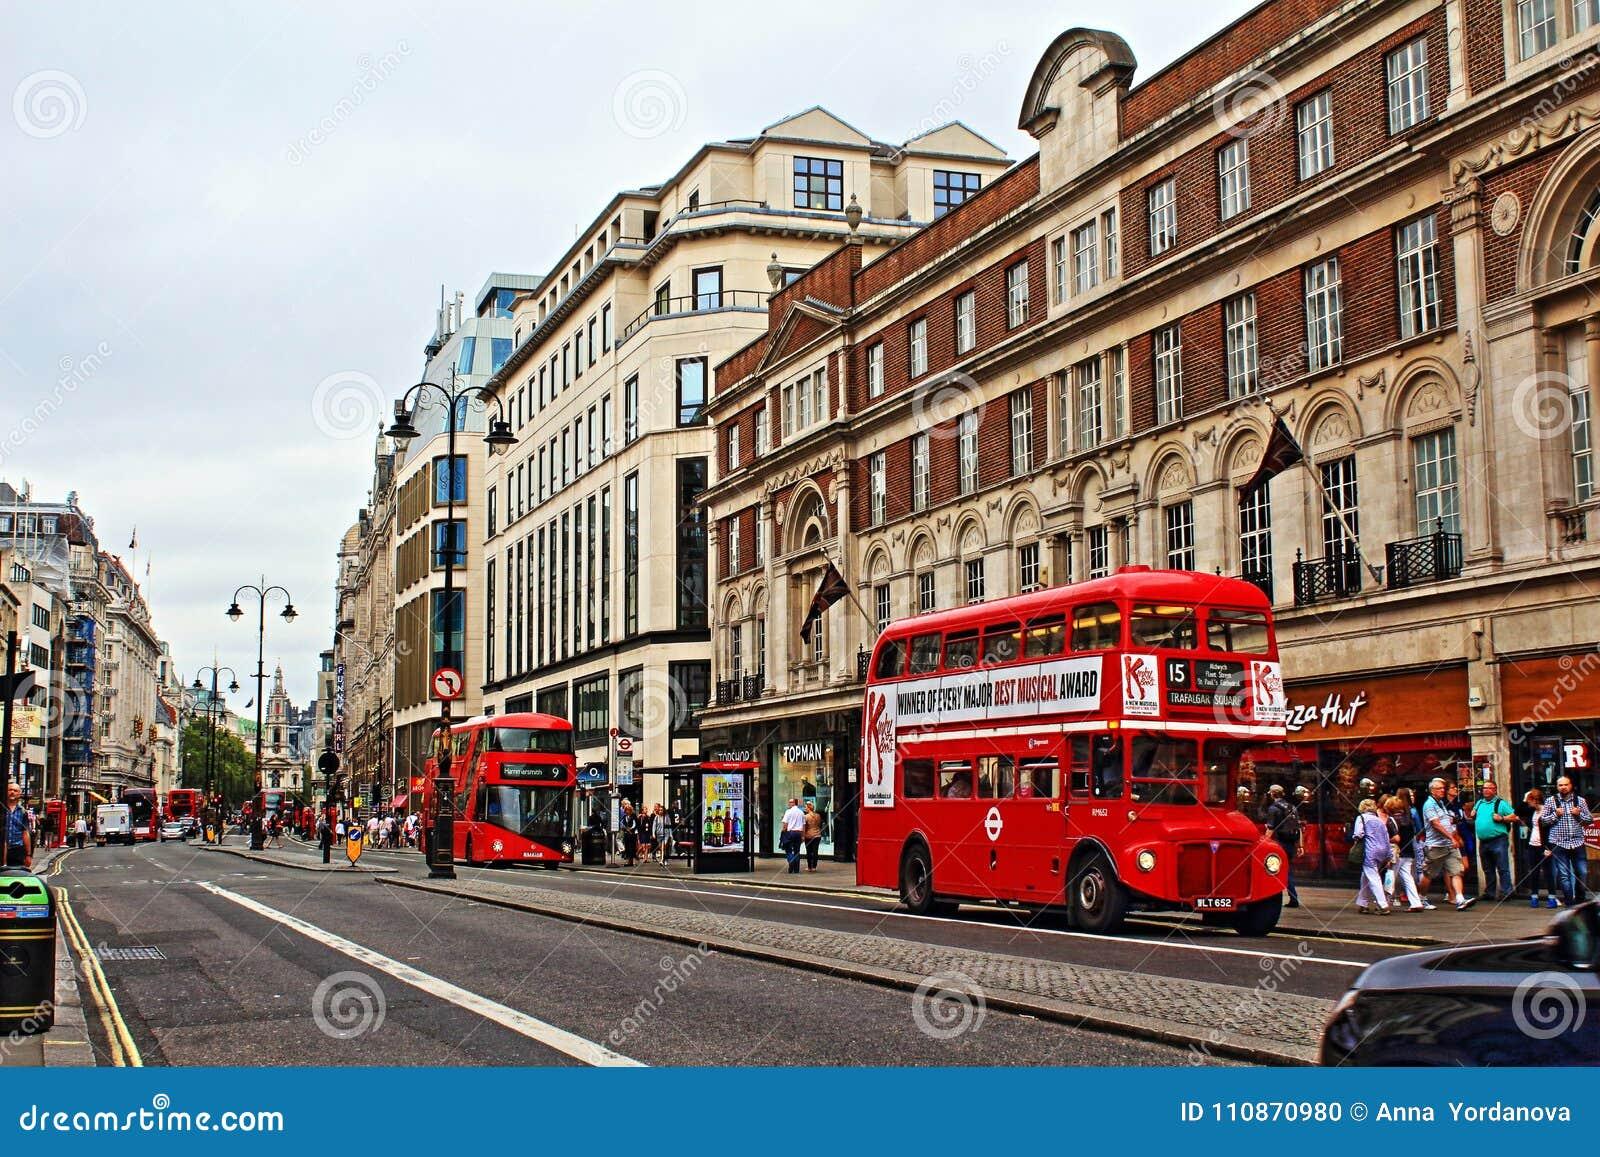 Red buses on Strand London England United Kingdom